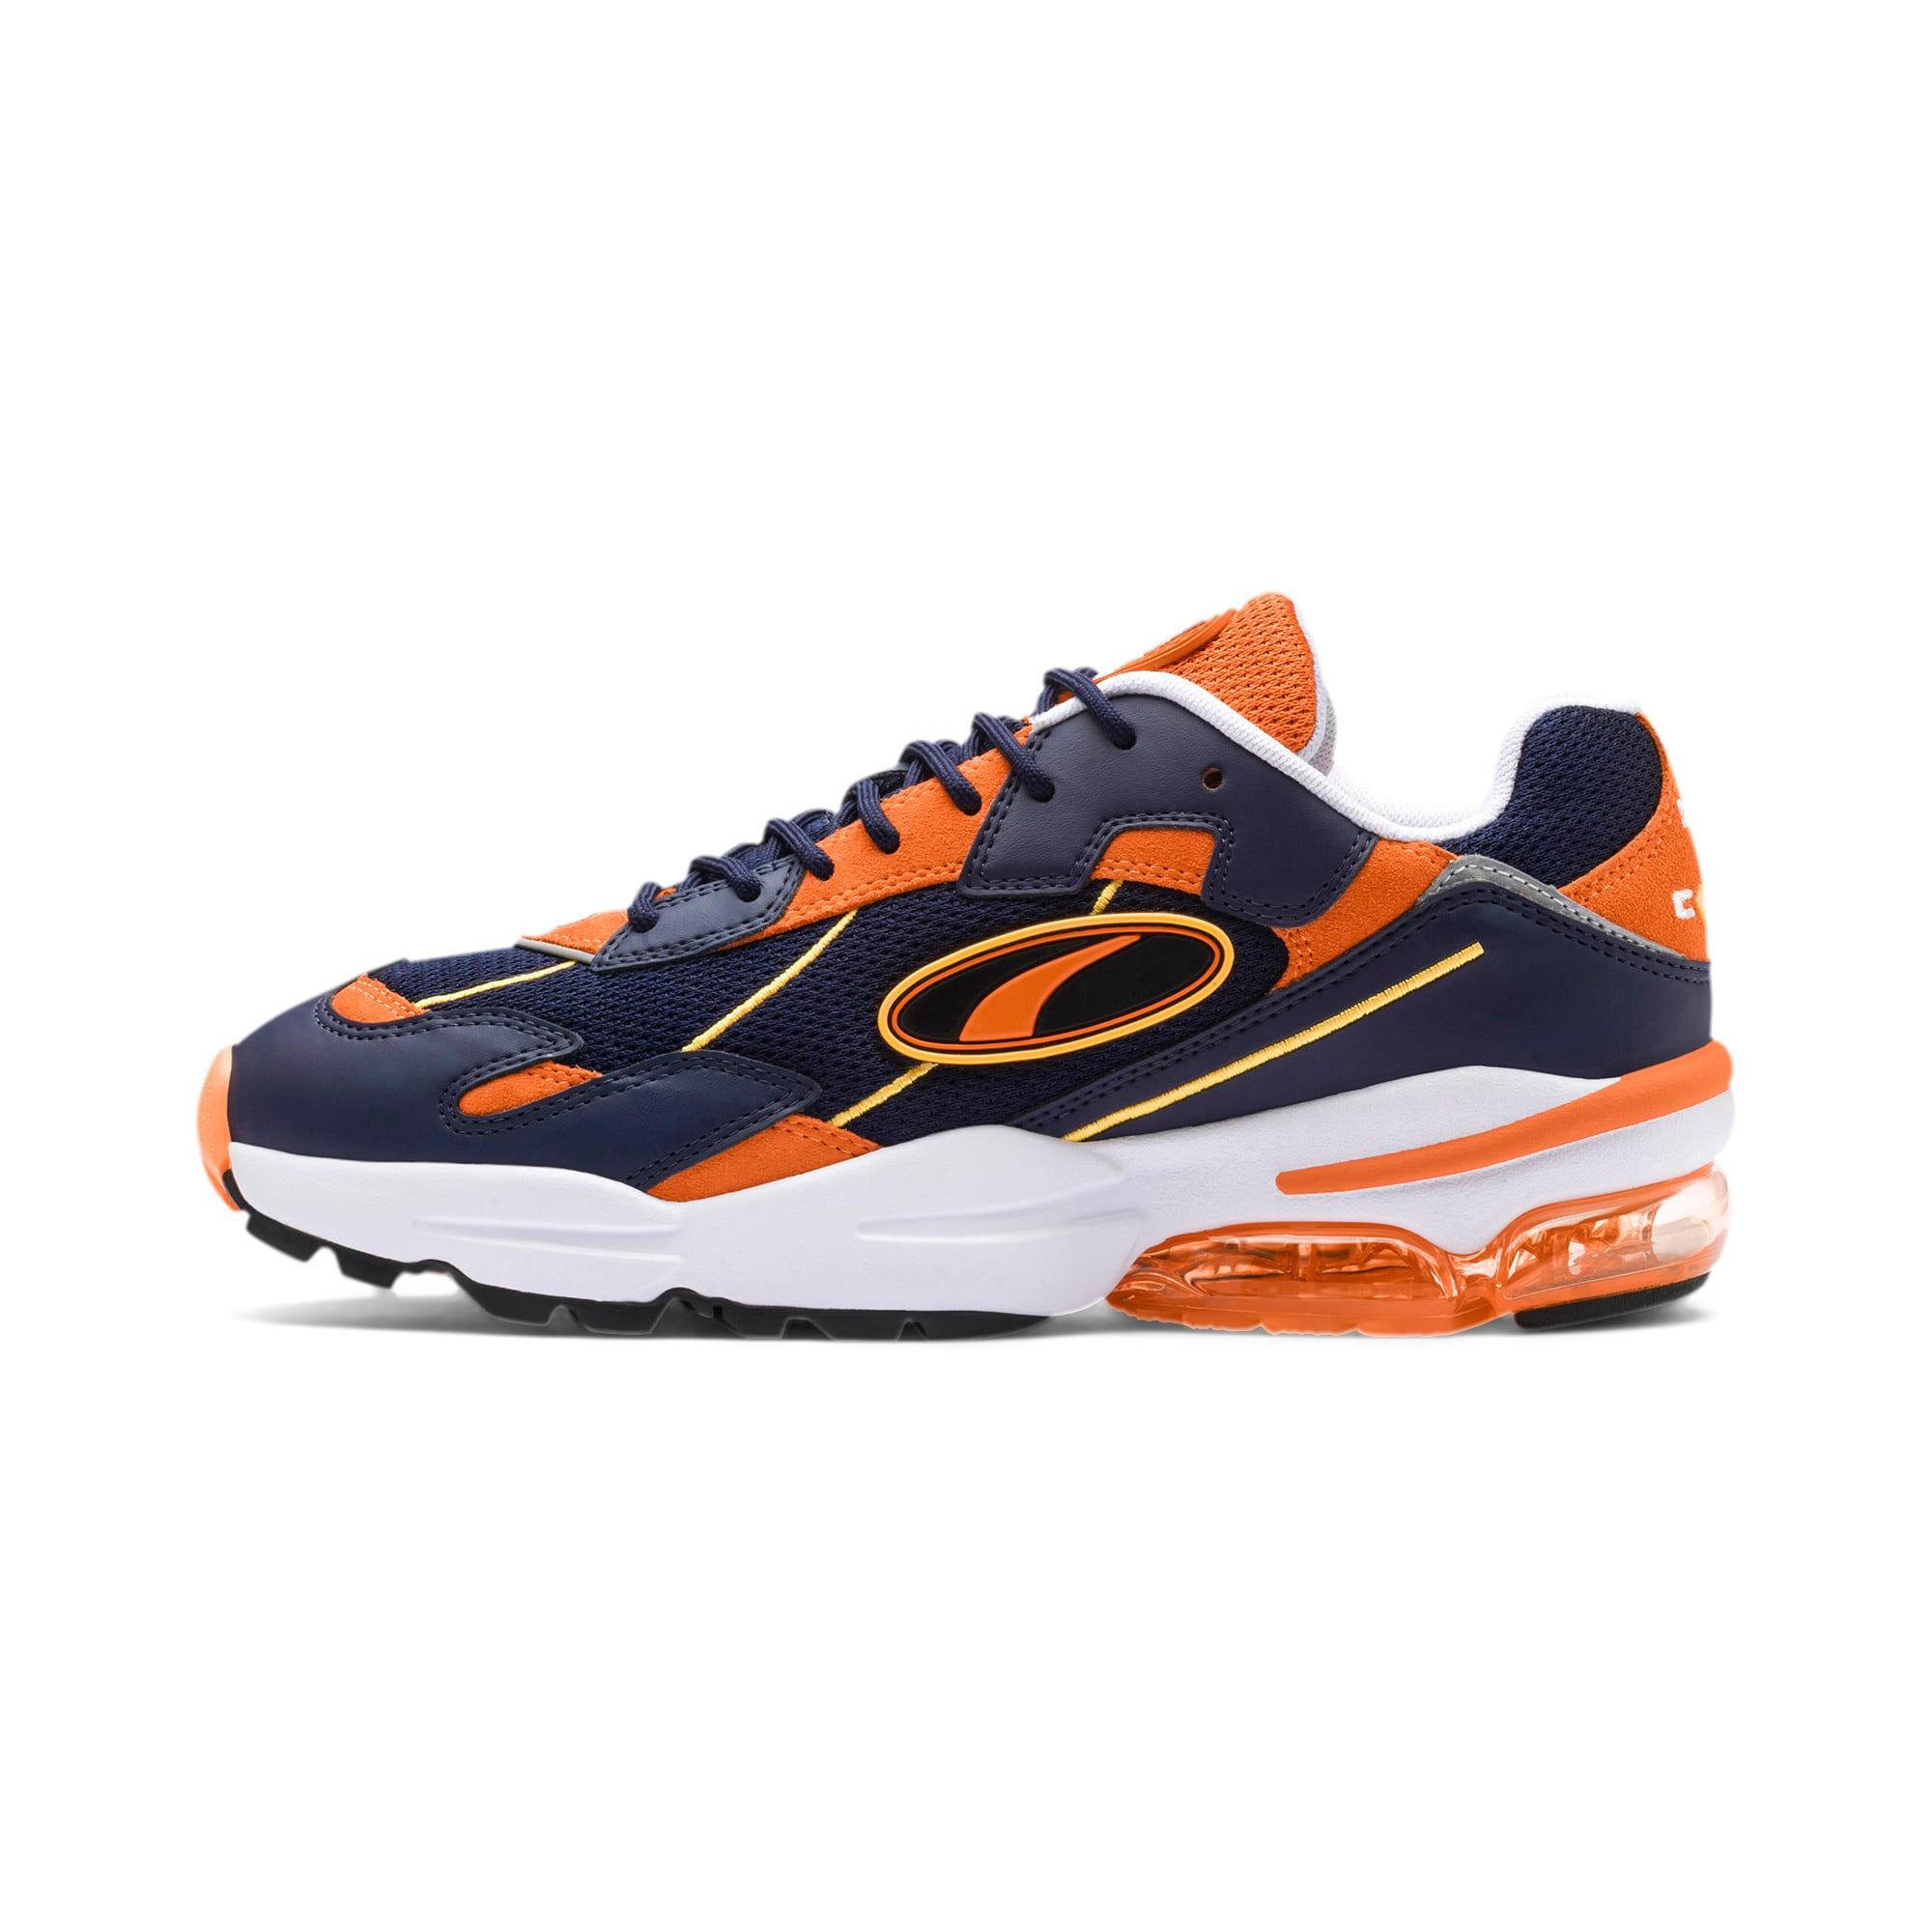 Thumbnail 1 of CELL Ultra OG Pack Sneakers, Peacoat-Jaffa Orange, medium